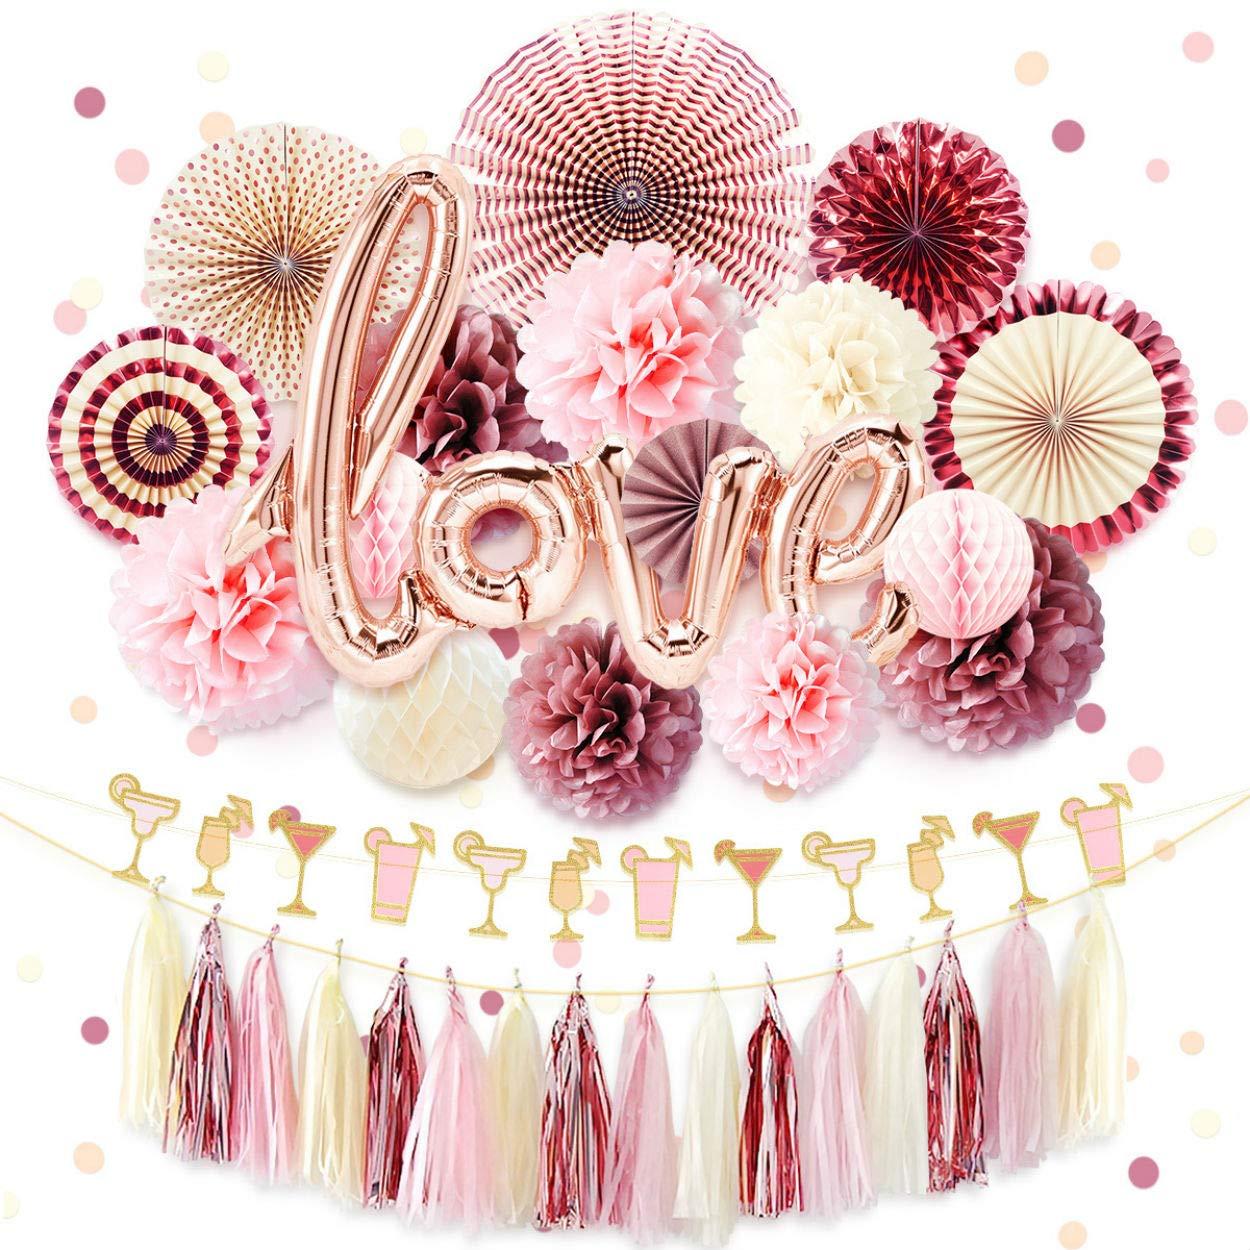 Amazon.com: NICROLANDEE Rose Gold Bridal Shower Decorations Pack ...